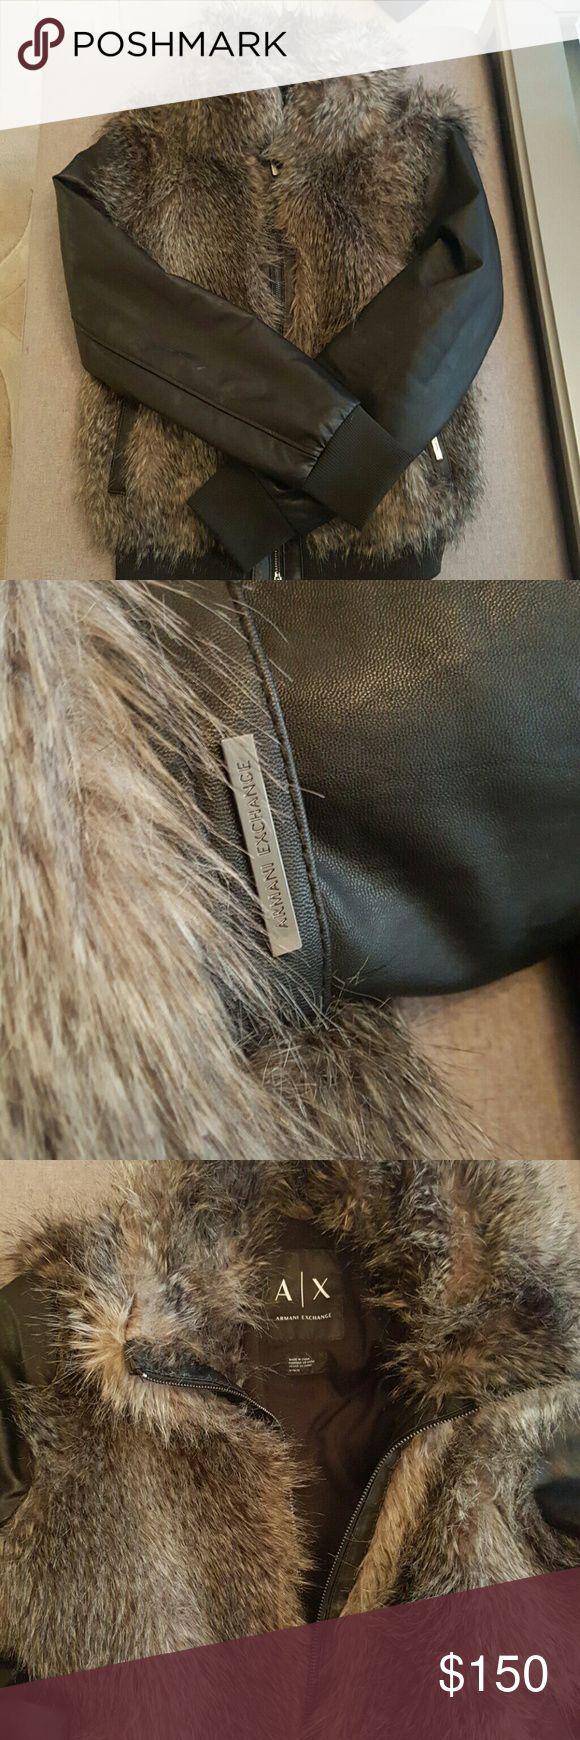 Armani Exchange Faux fur leather bomber Armani Exchange faux fur bomber jacket. Worn Twice. Purchased in December. Armani Exchange Jackets & Coats